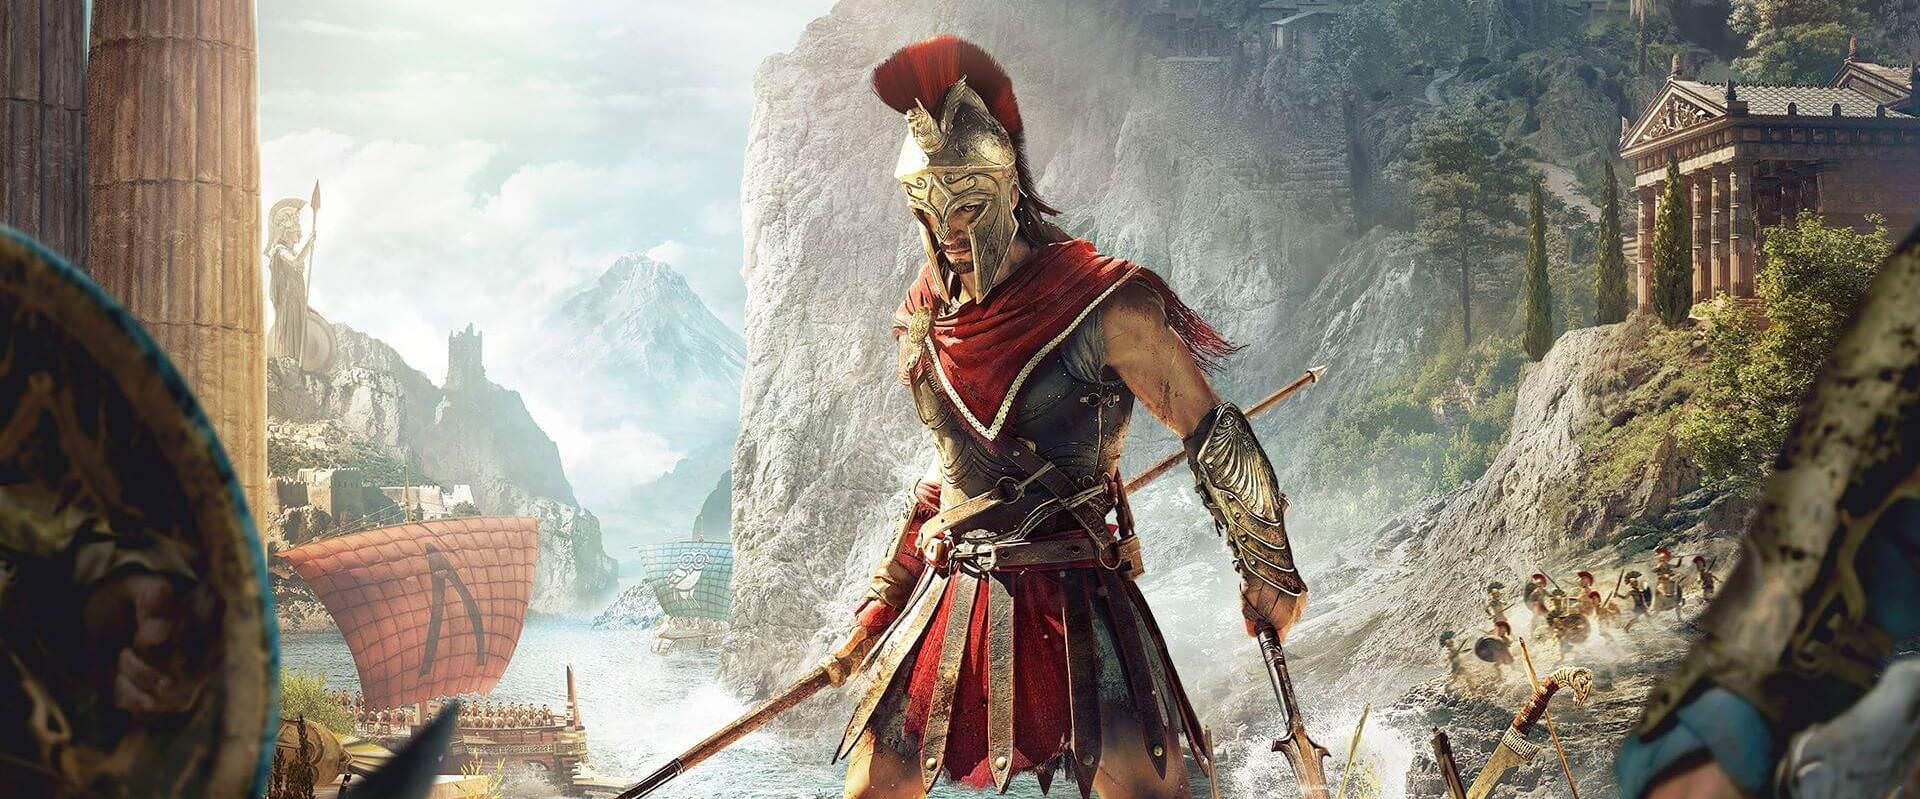 Assassin's Creed: Odyssey Uplay Key EUROPE